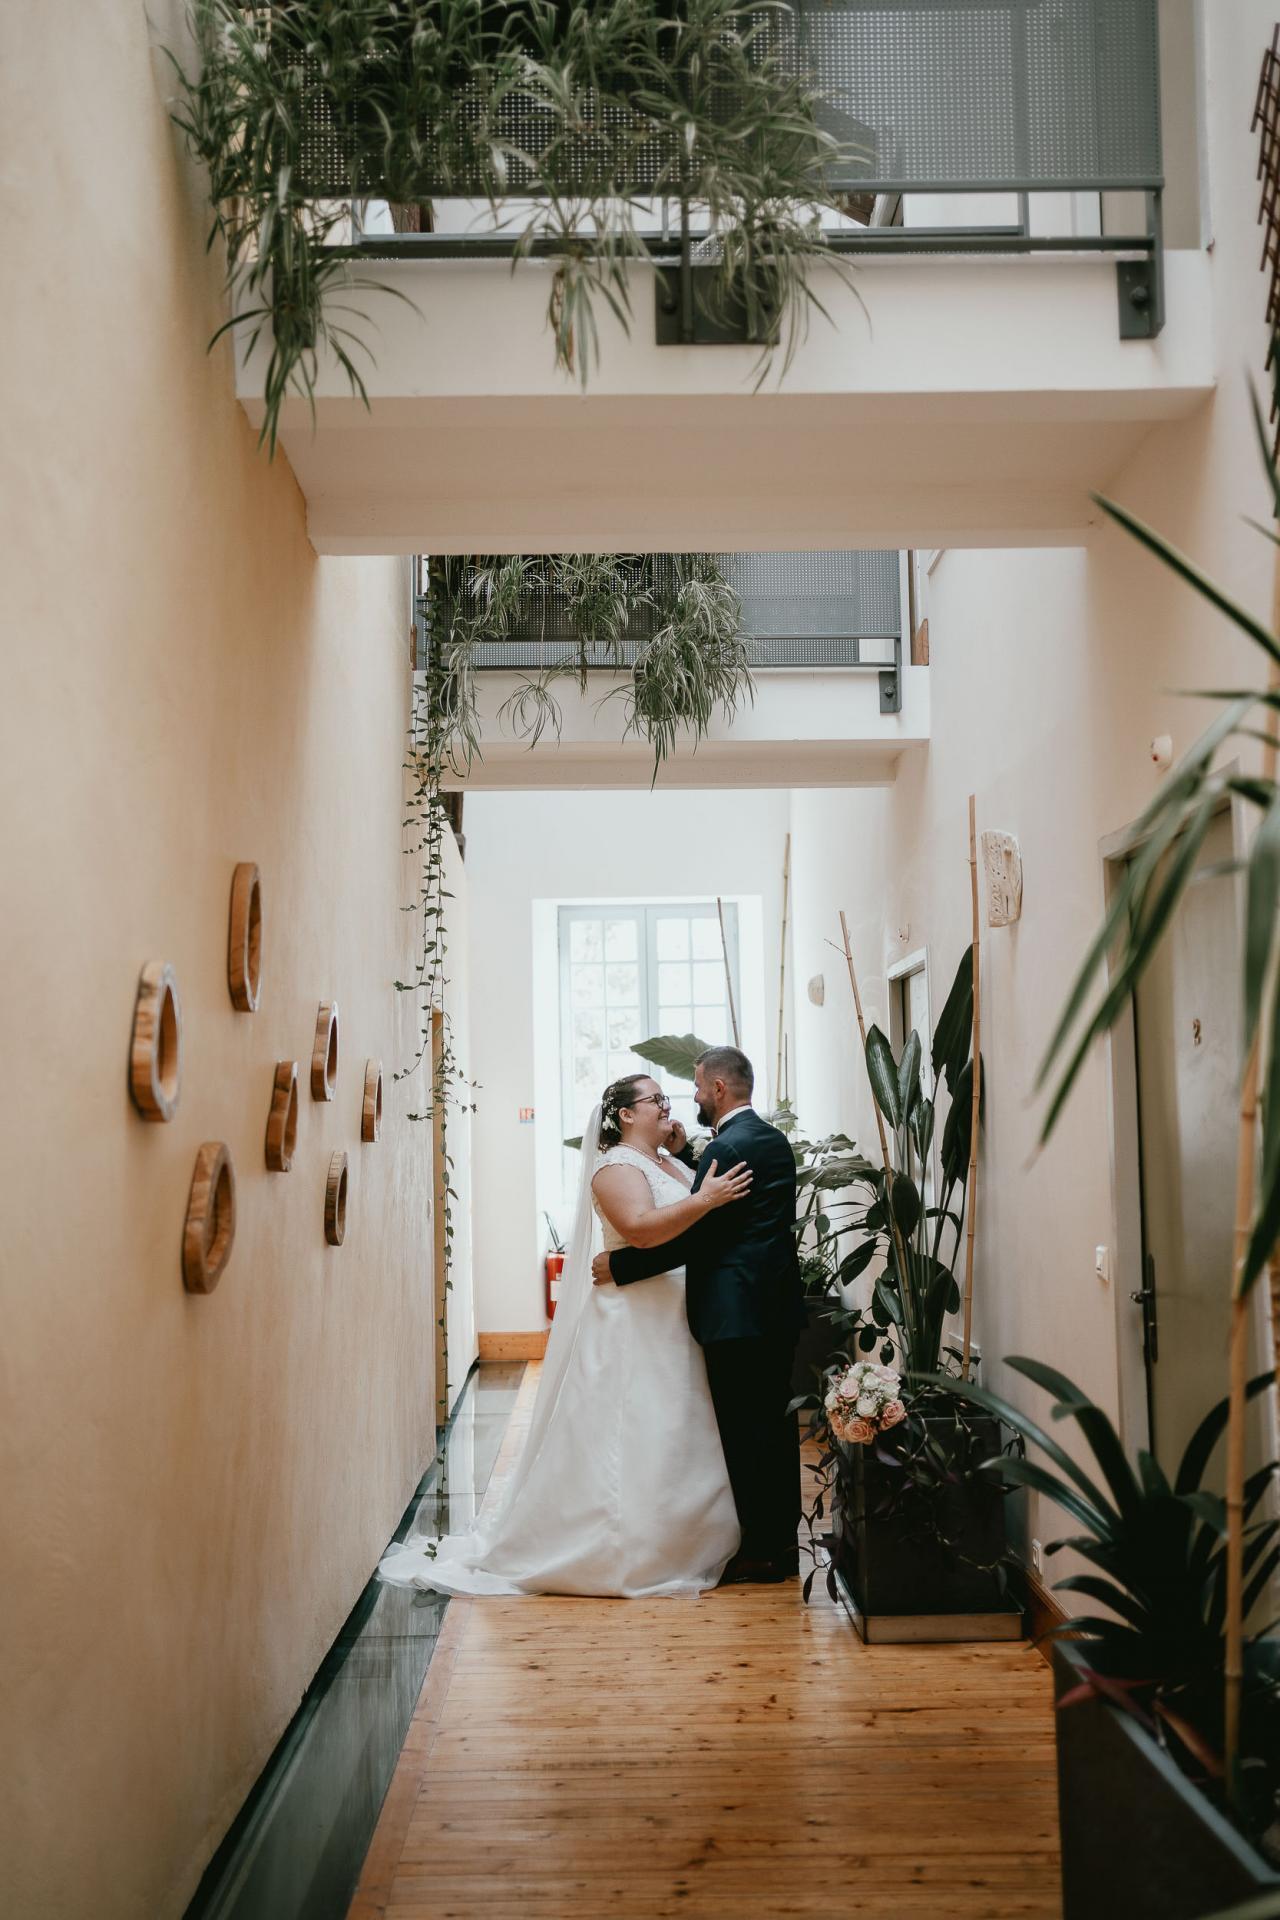 Photographe de mariage moody boho chic boheme dax landes aquitaine fineart 37